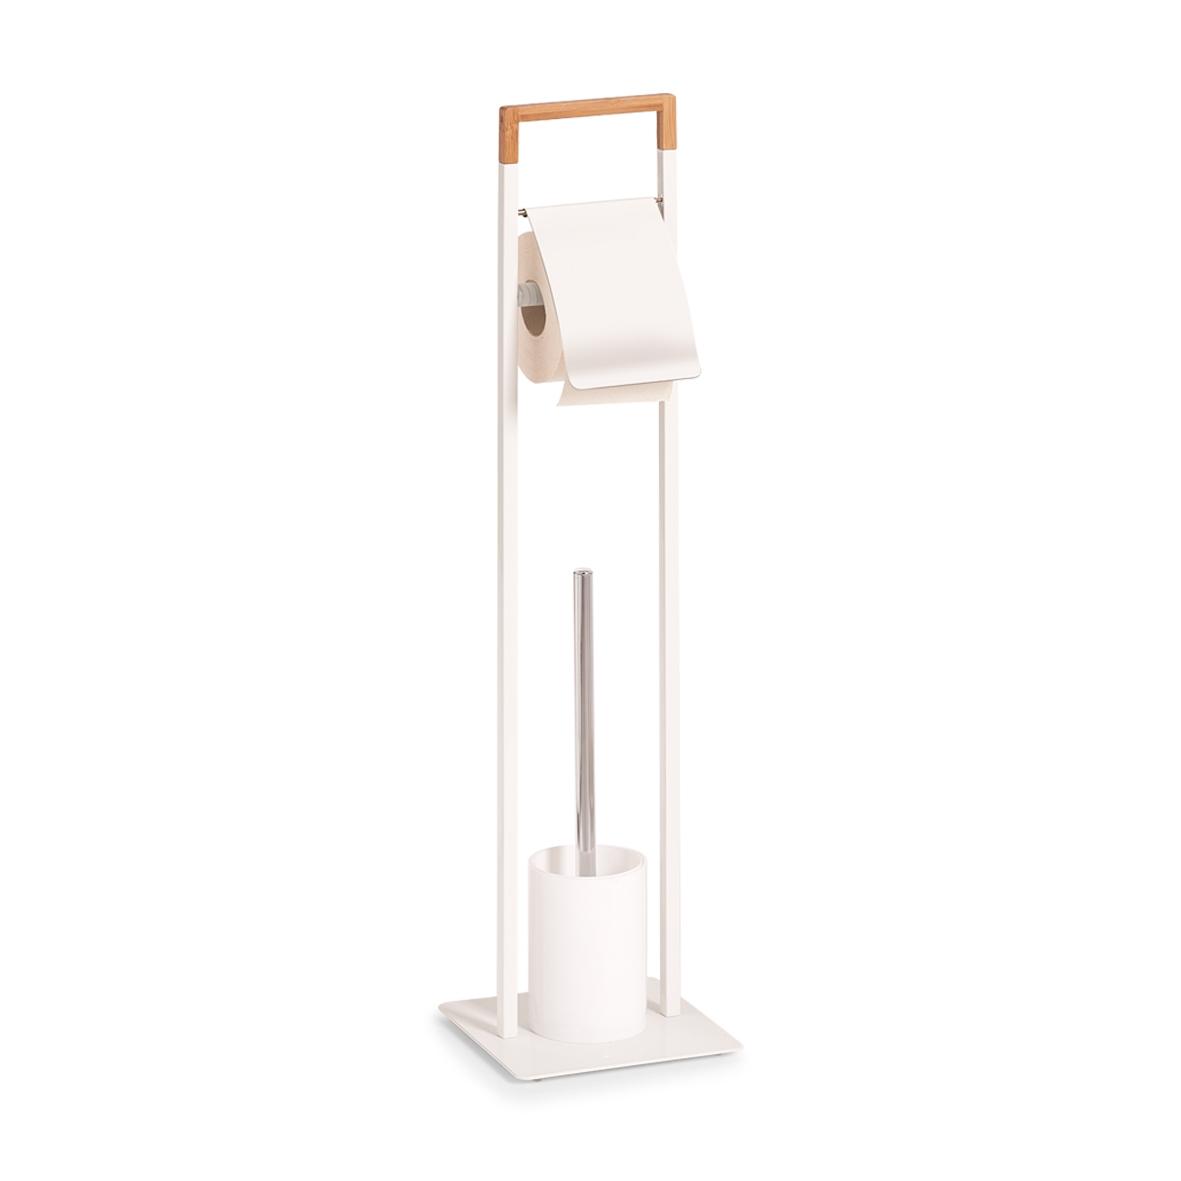 Suport pentru hartie igienica si perie de toaleta, Bamboo Metal White, l19xA19xH74,5 cm imagine